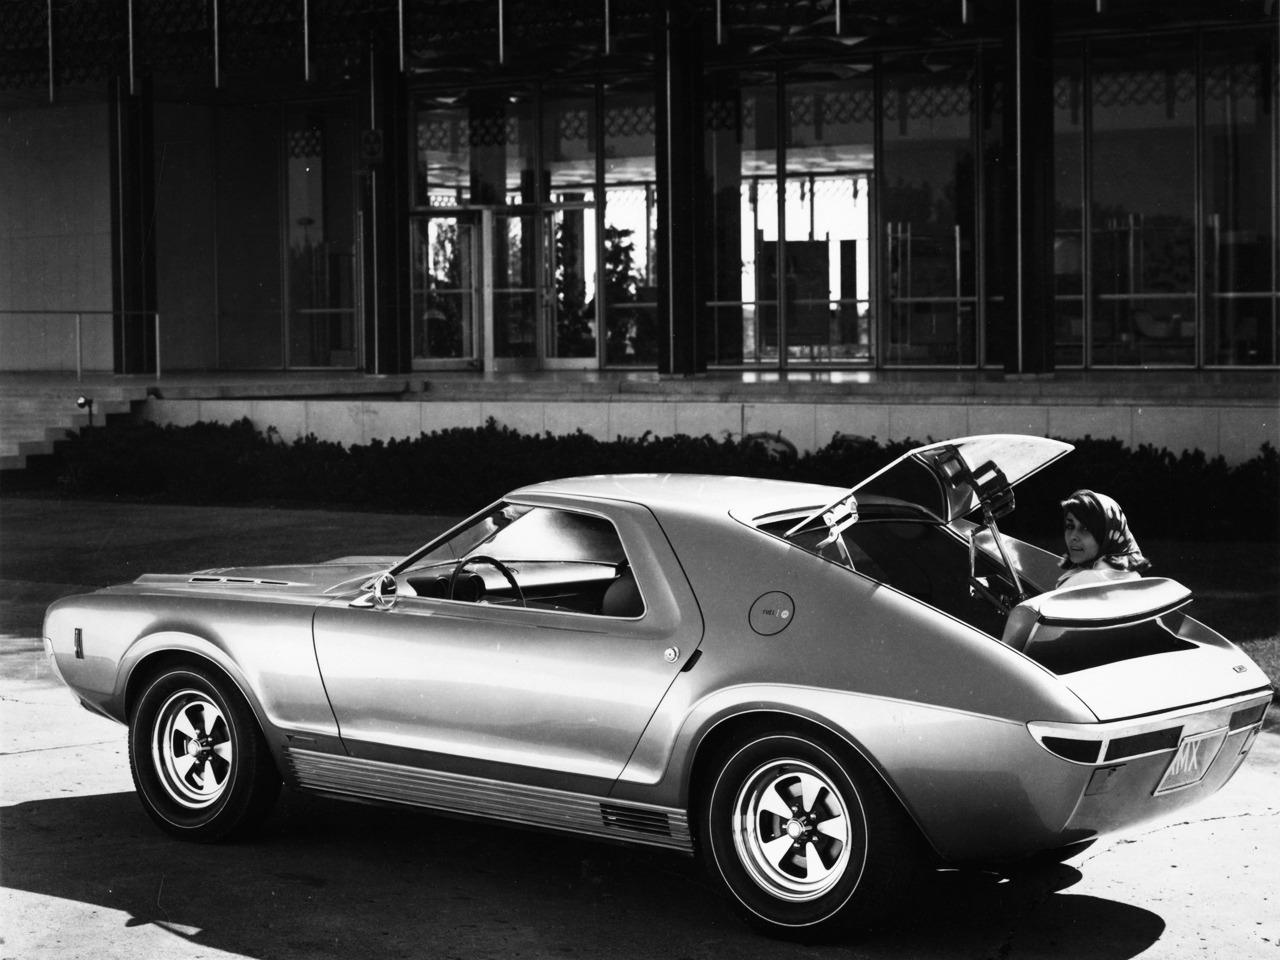 AMC AMX I Concept Car (1965) – Old Concept Cars